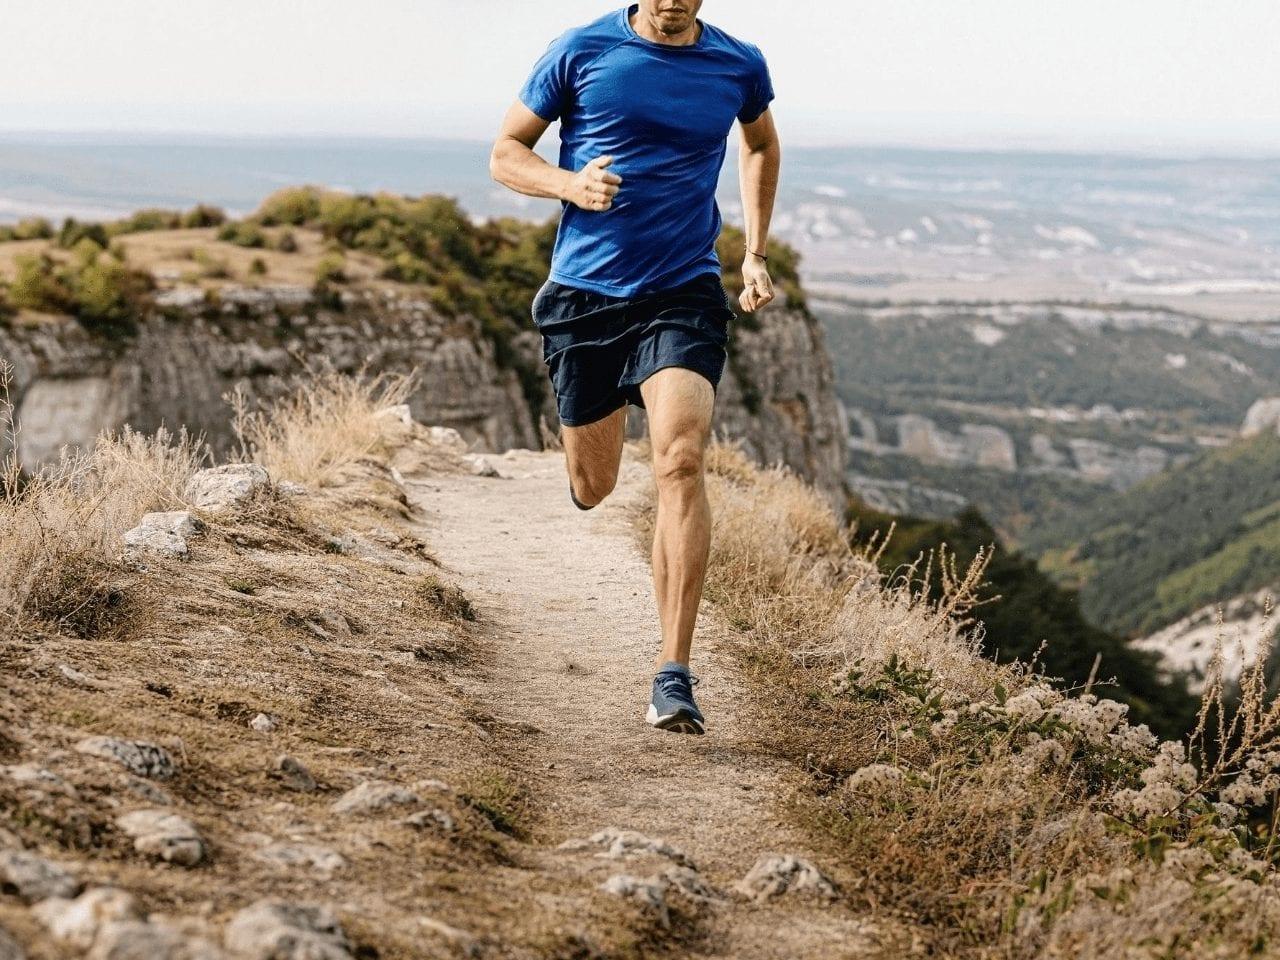 Man running on trails